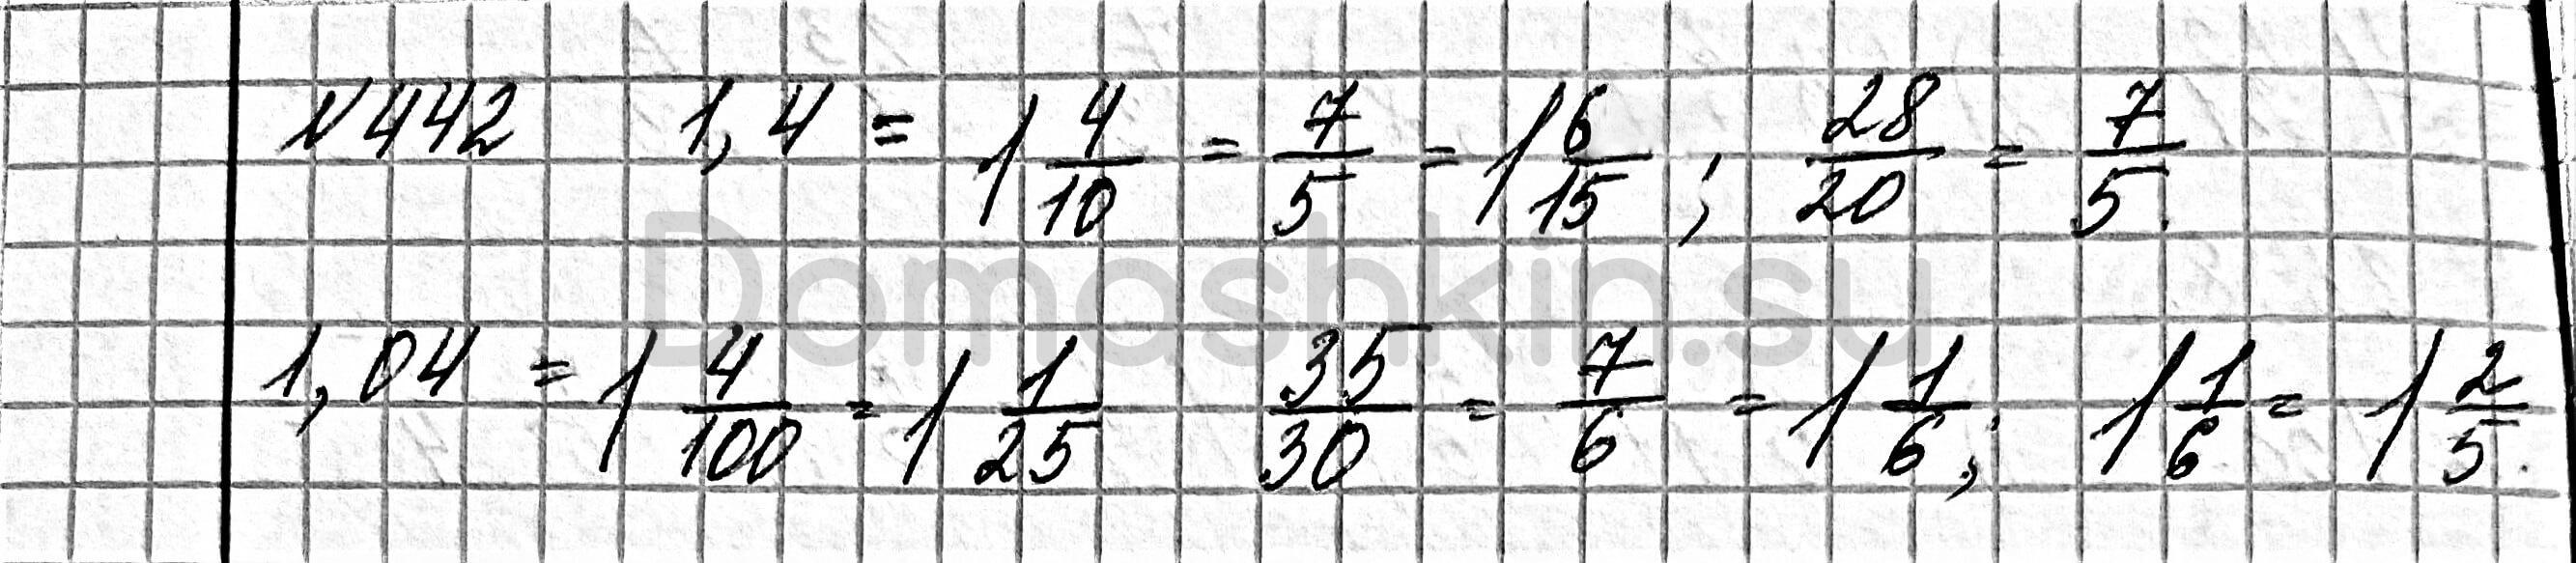 Математика 6 класс учебник Мерзляк номер 442 решение